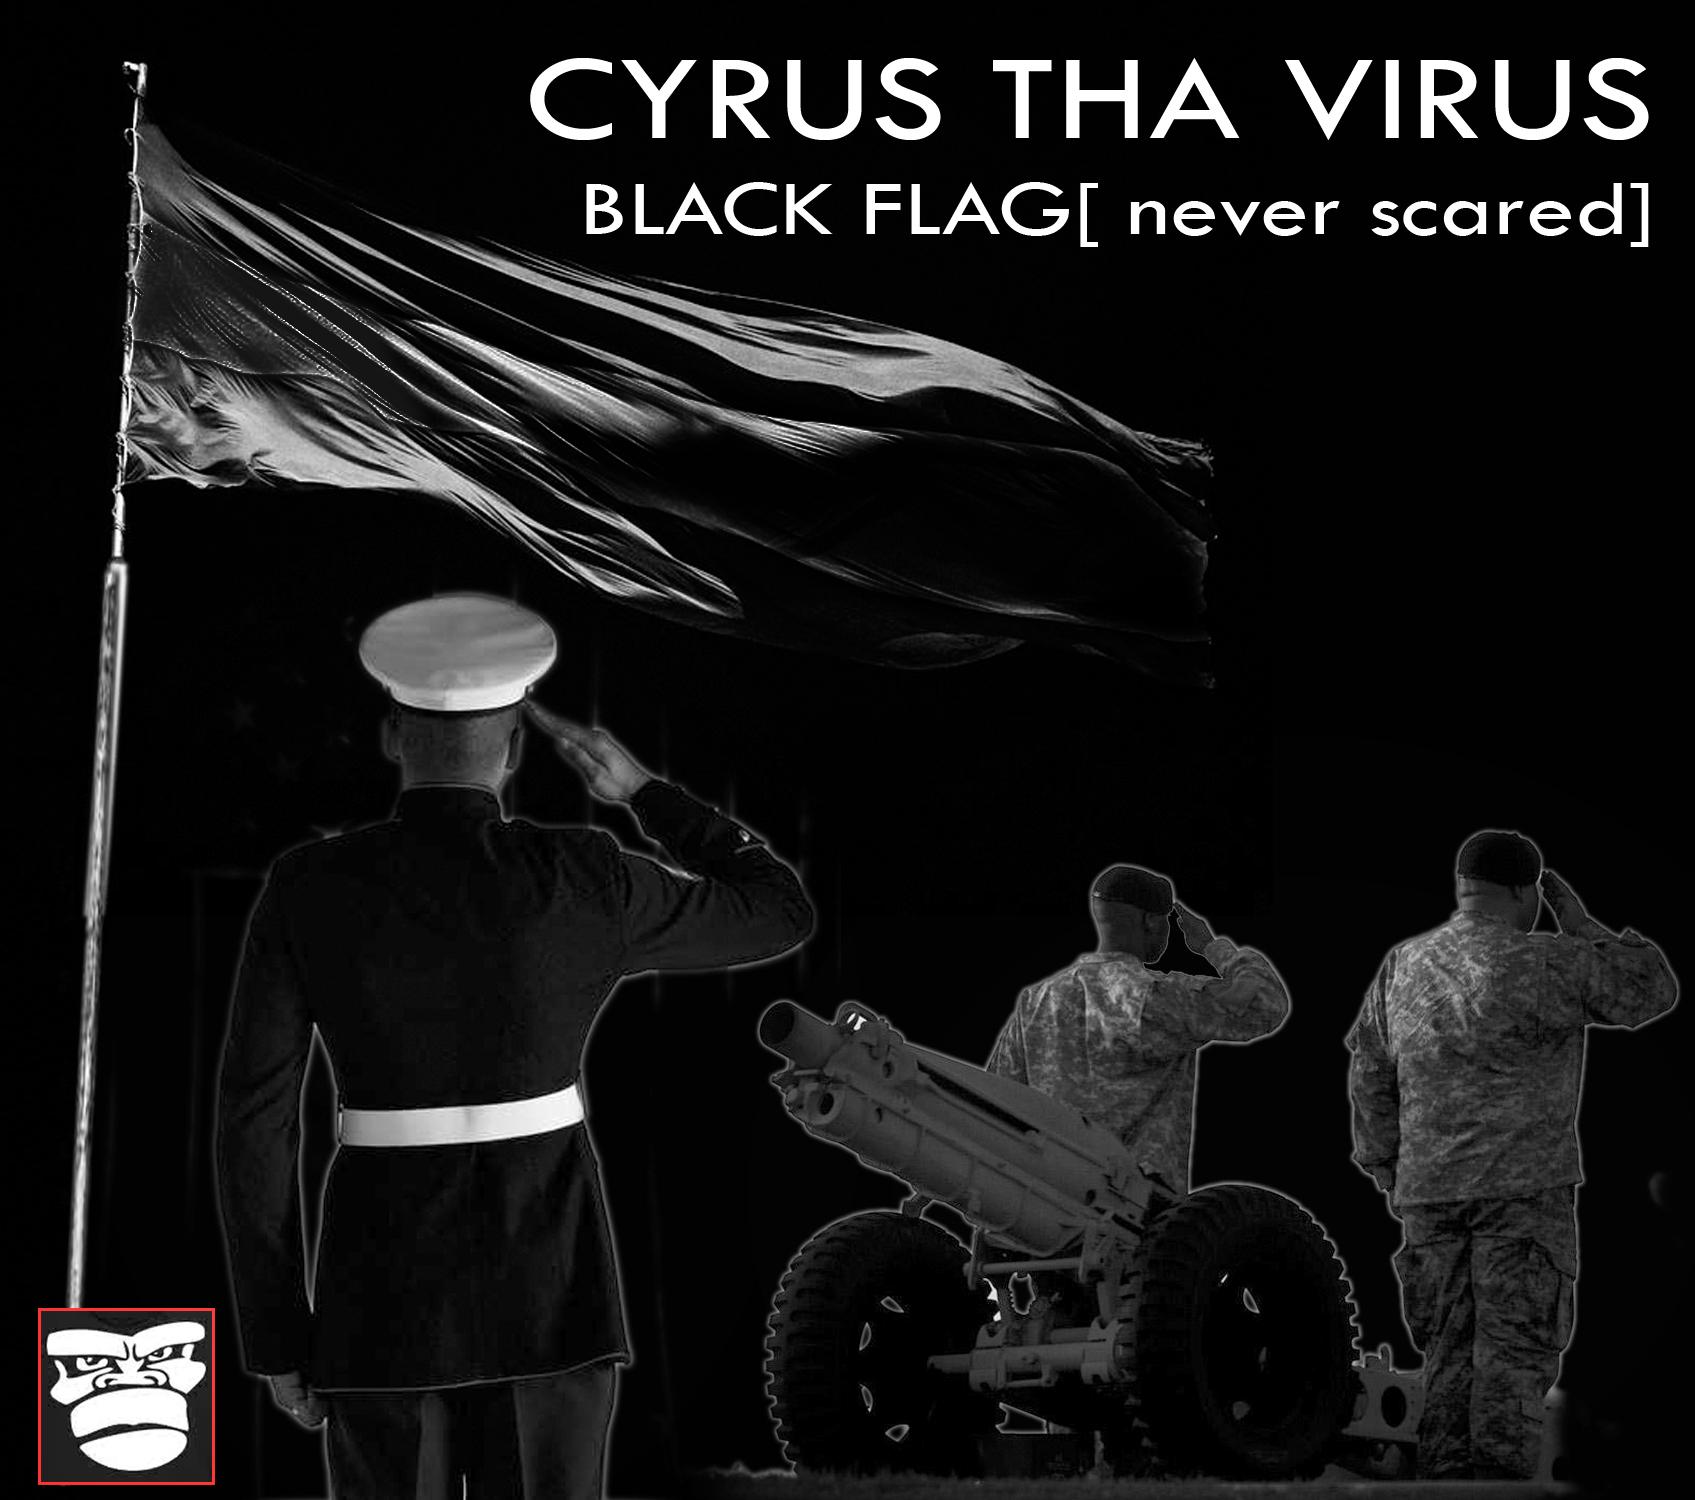 cyrus_black